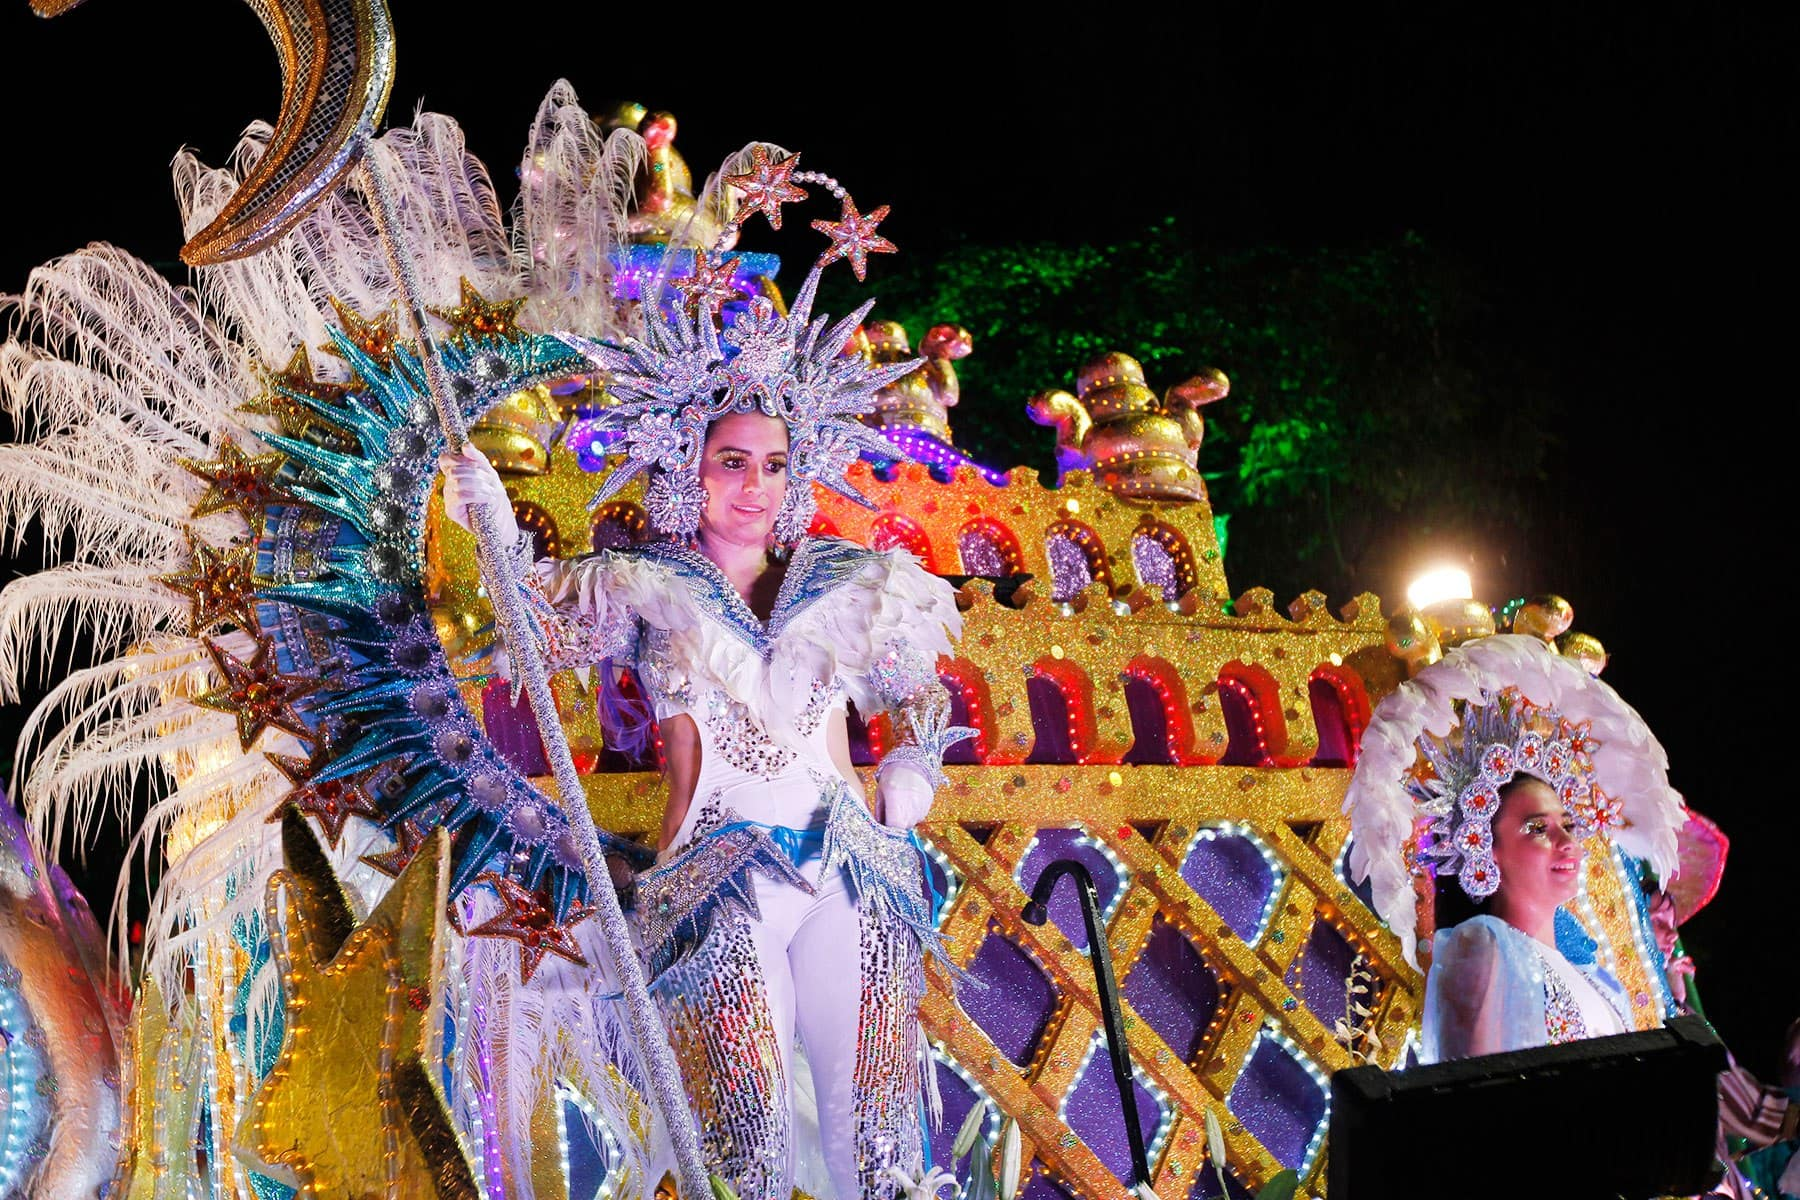 vacances-festival-de-la-luz-costa-rica-decouverte